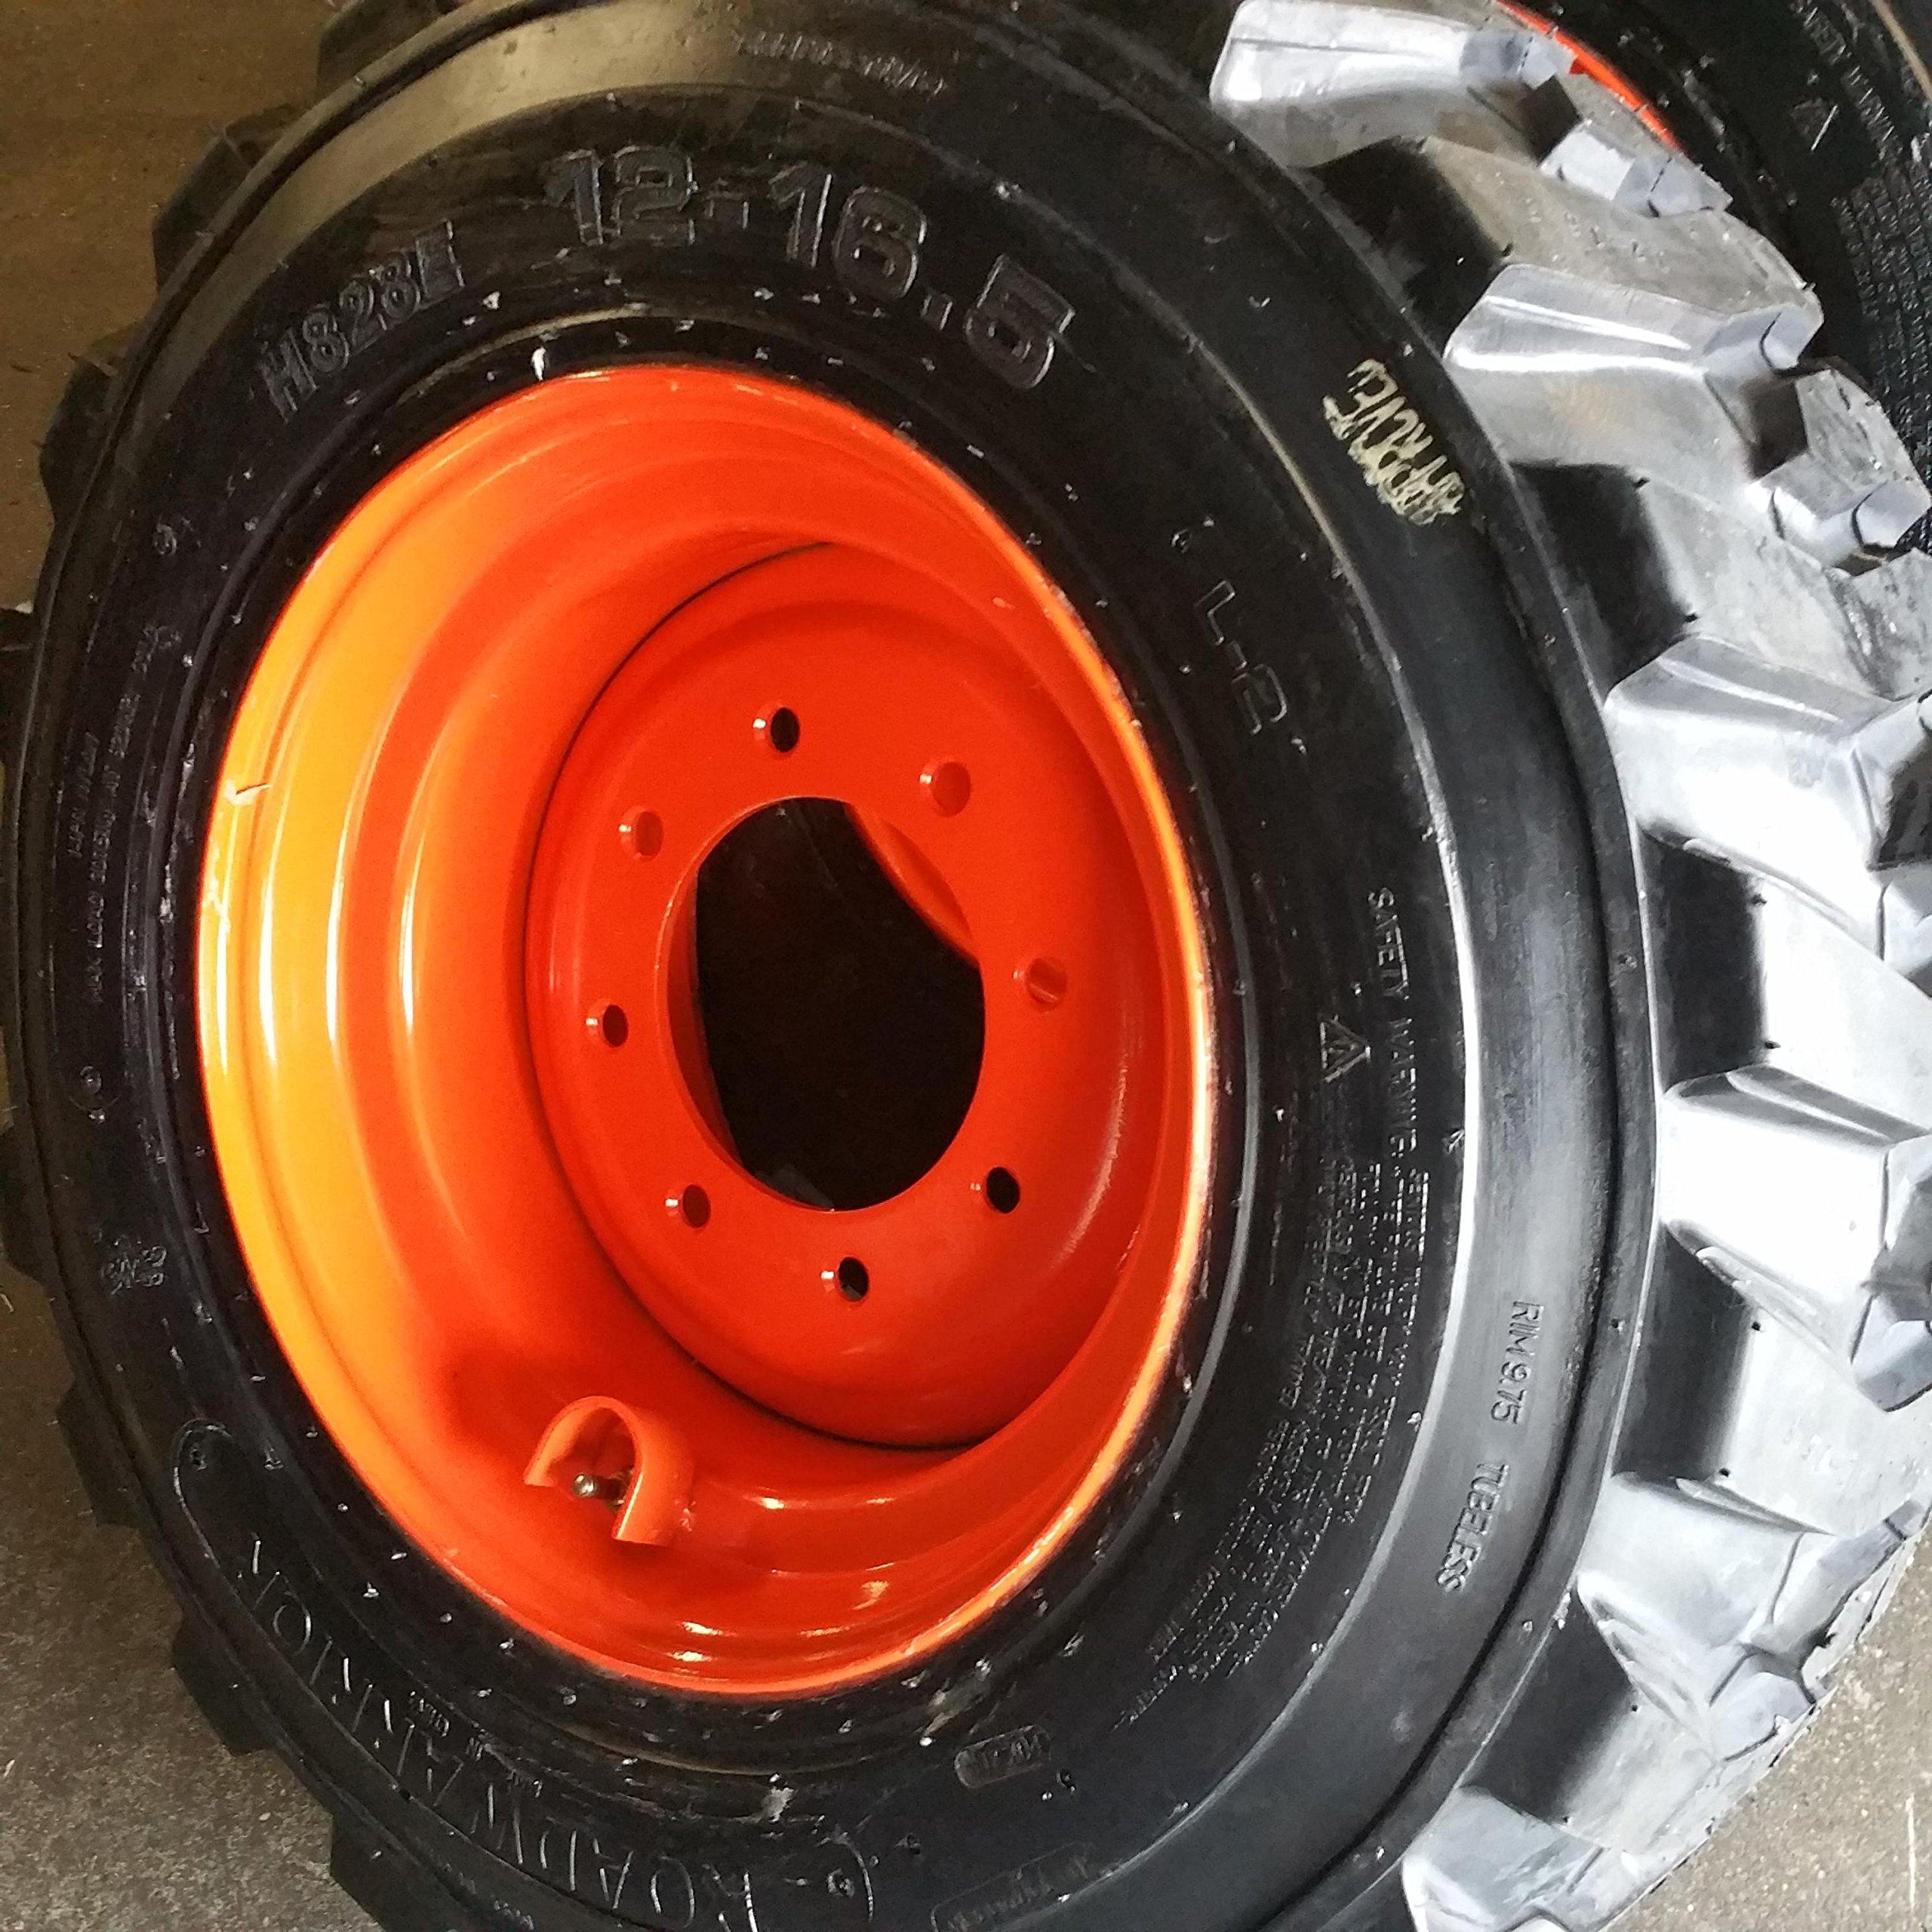 SET OF FOUR (4) 12-16.5 SKID STEER LOADER TIRE S with ORANGE Color Rims mounted, 14 PLY, NHS SKS 400-12x16.5